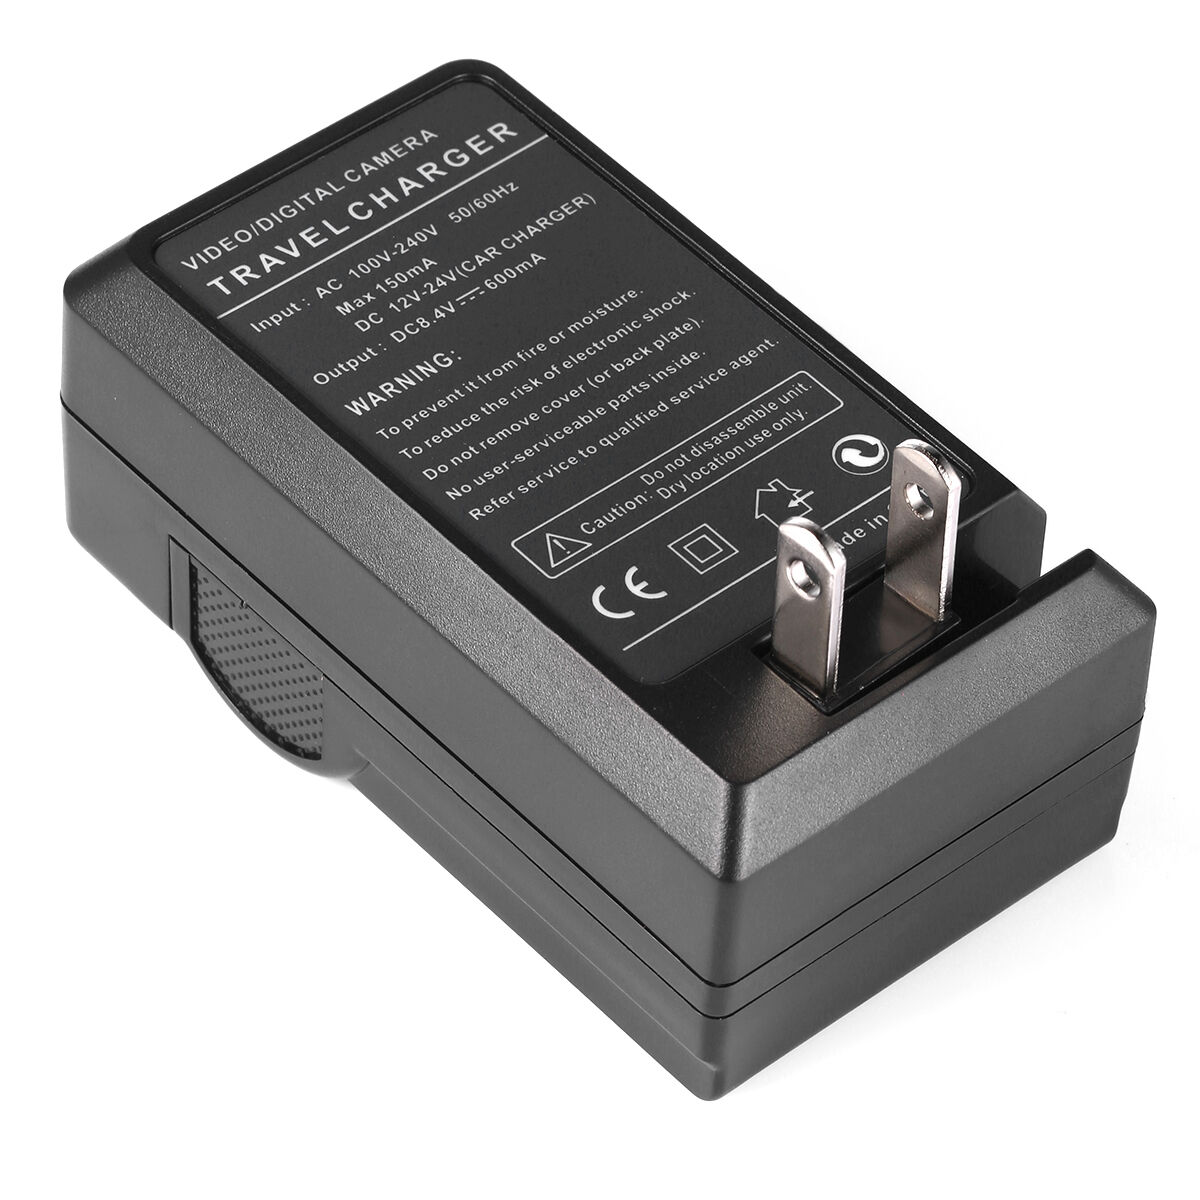 Купить EN-EL14 Battery + Charger for Nikon D5100 D5200 D5300 D3200 D3100 Coolpix P7000